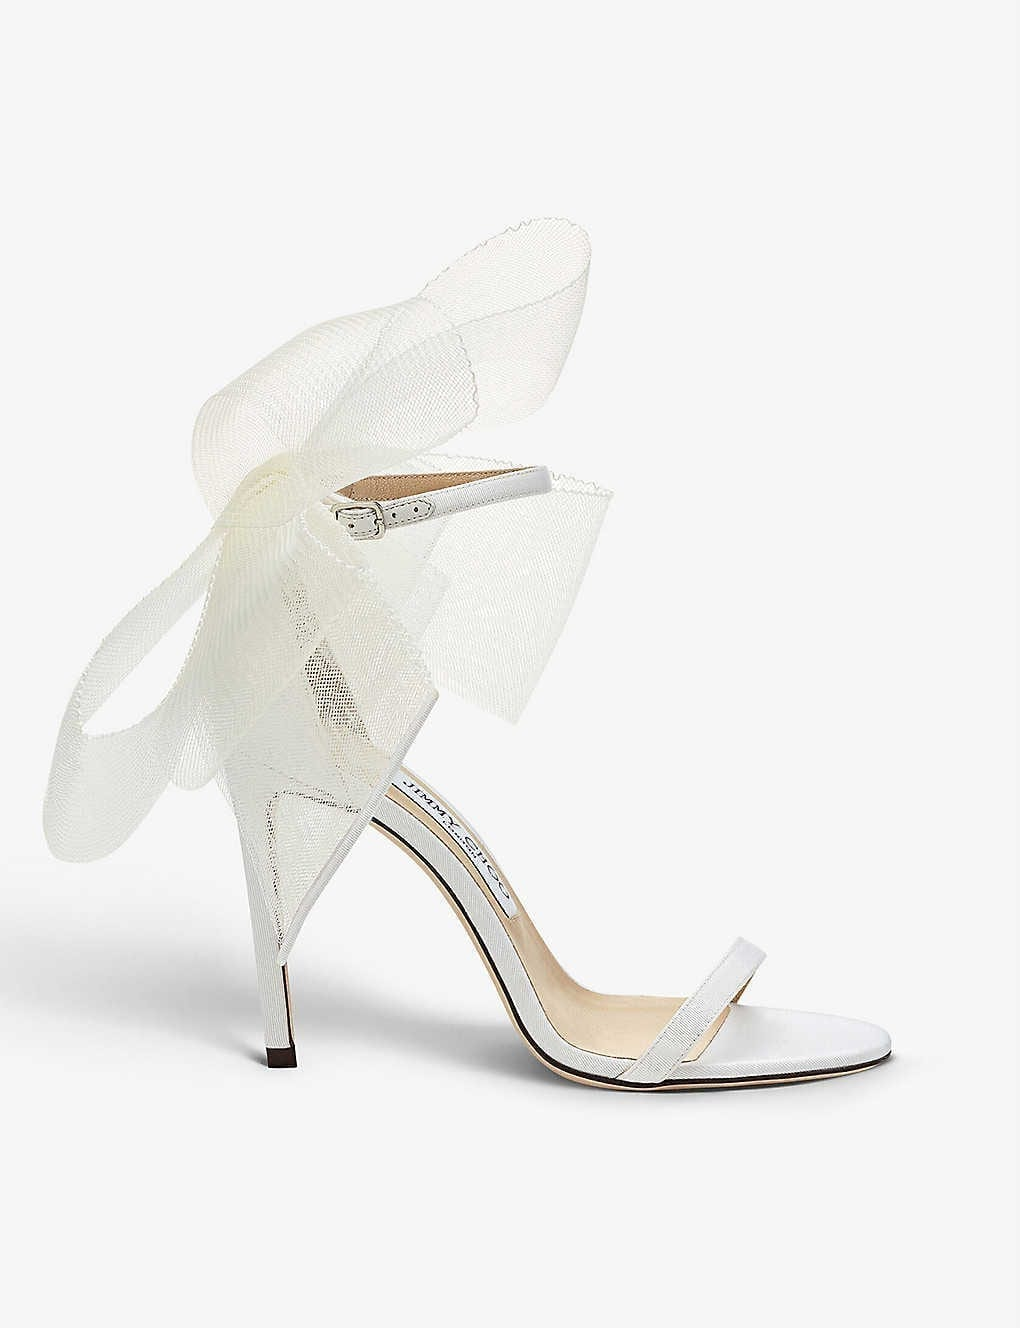 JIMMY CHOO Aveline 100 Asymmetric Leather Sandals